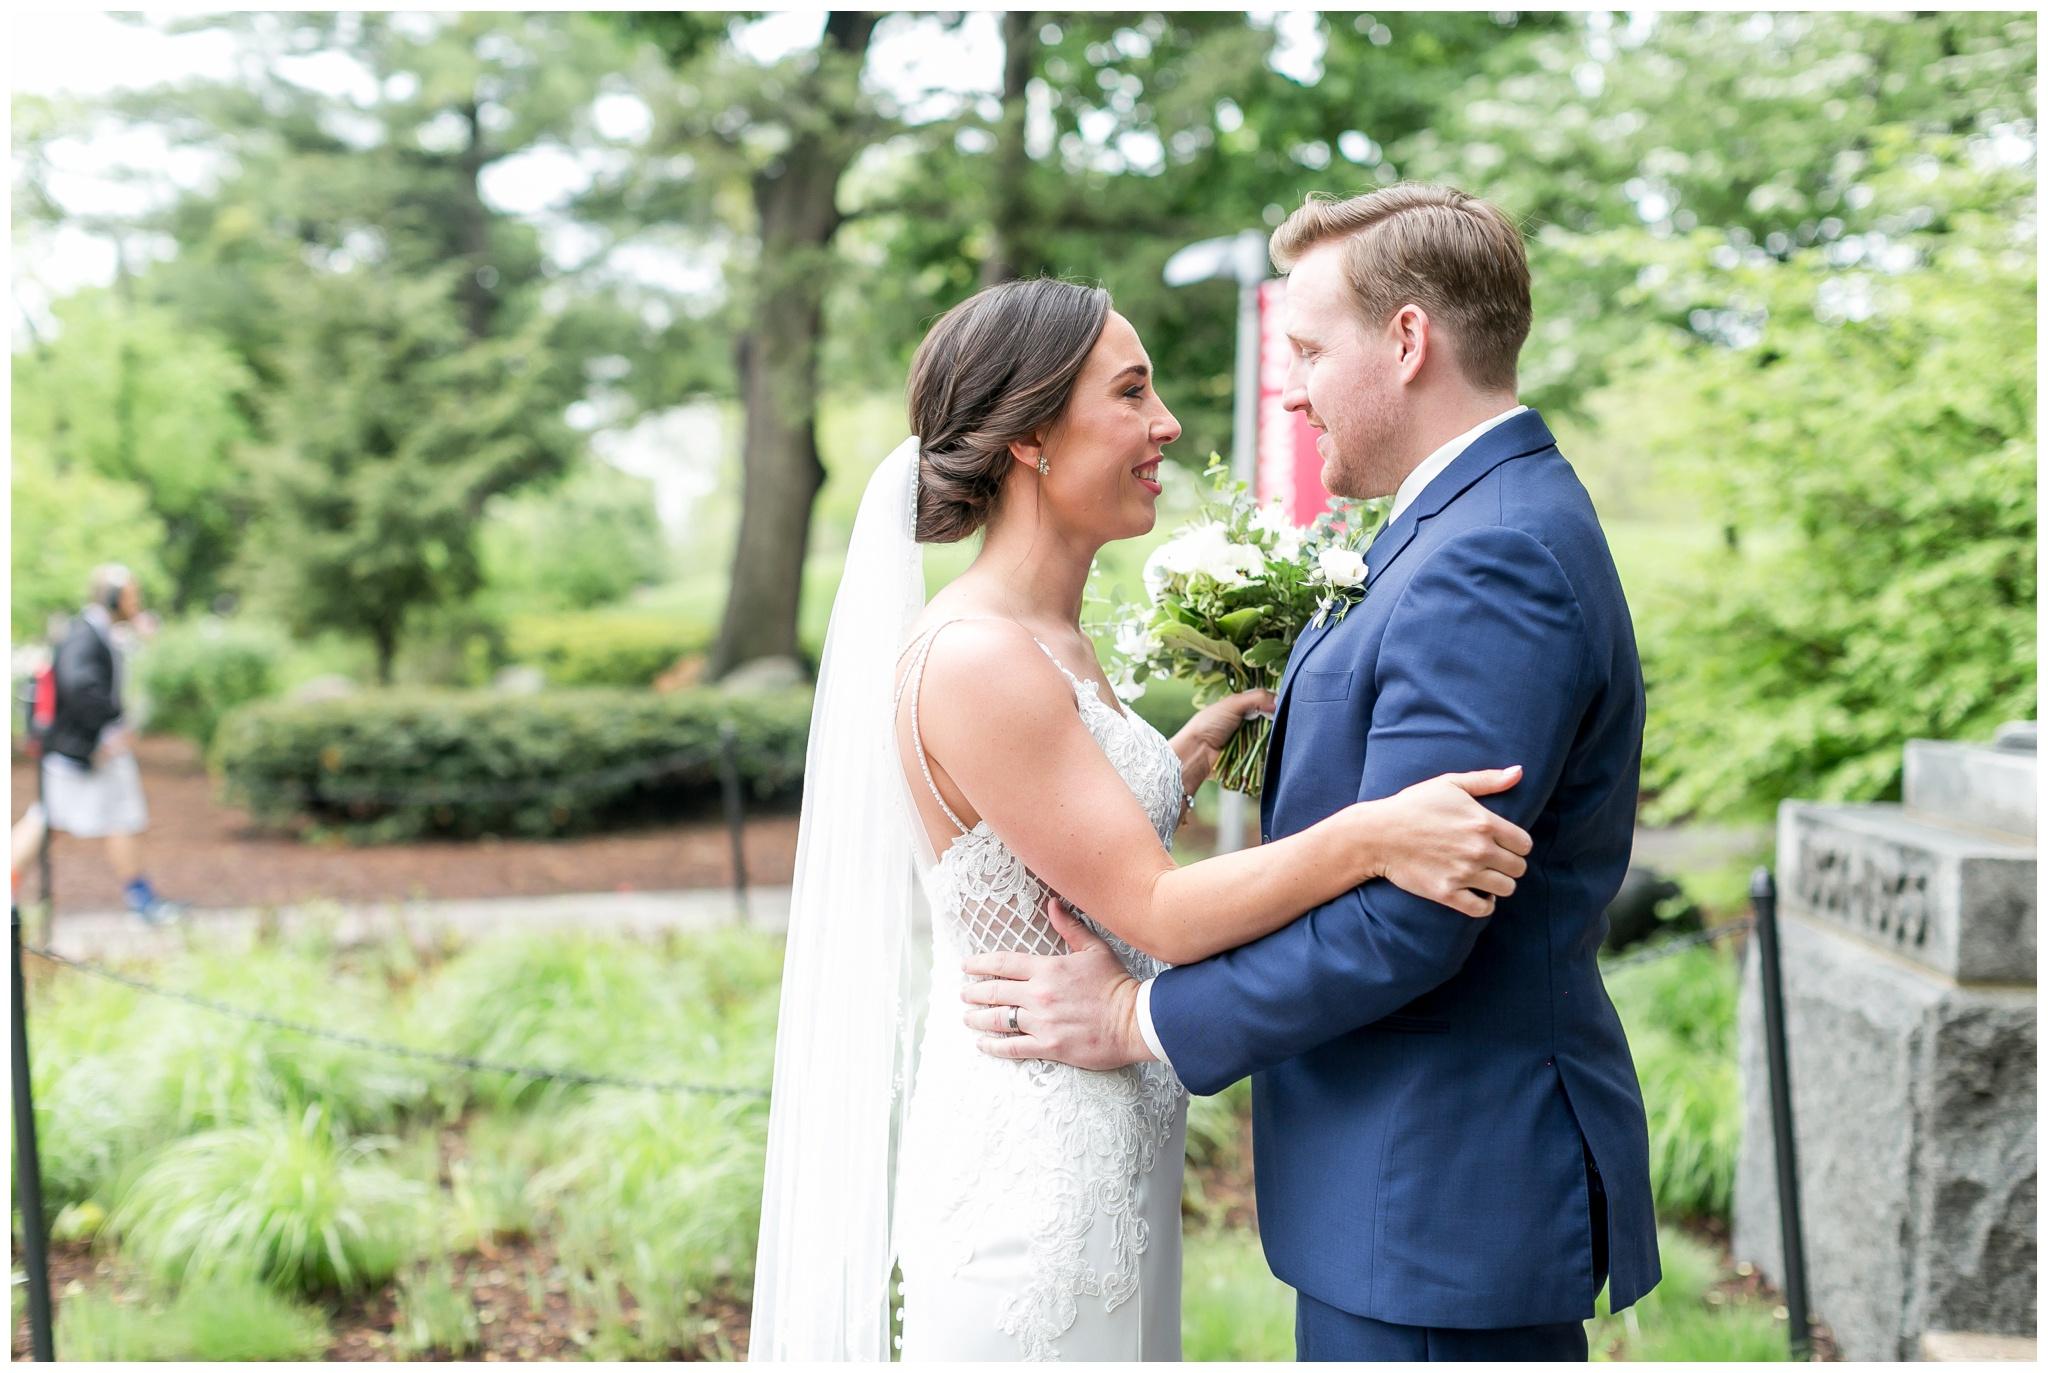 Union_south_Wedding_Madison_Wisconsin_Caynay_Photo_3631.jpg